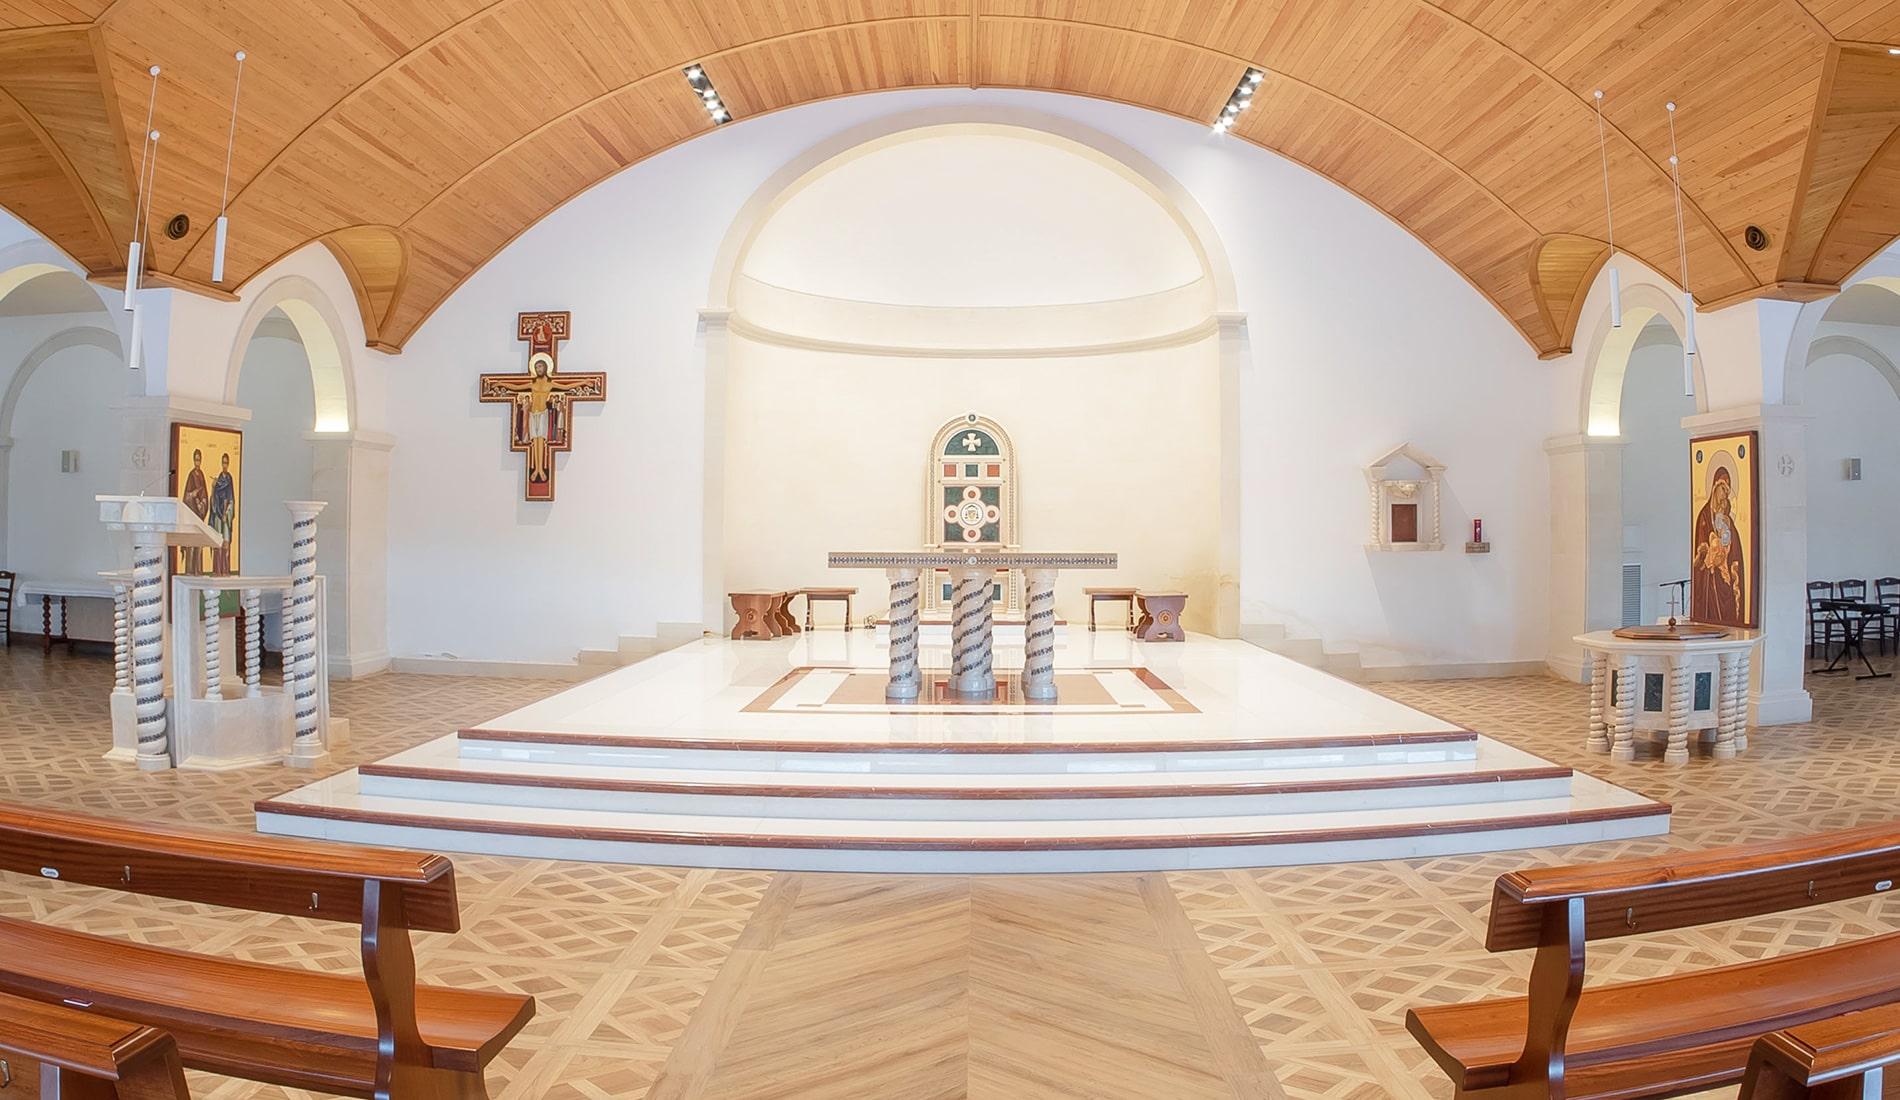 marmi-strada-villa-castelli-brindisi-marmi-graniti-mosaici-arte-sacra-architettura-chiese-6